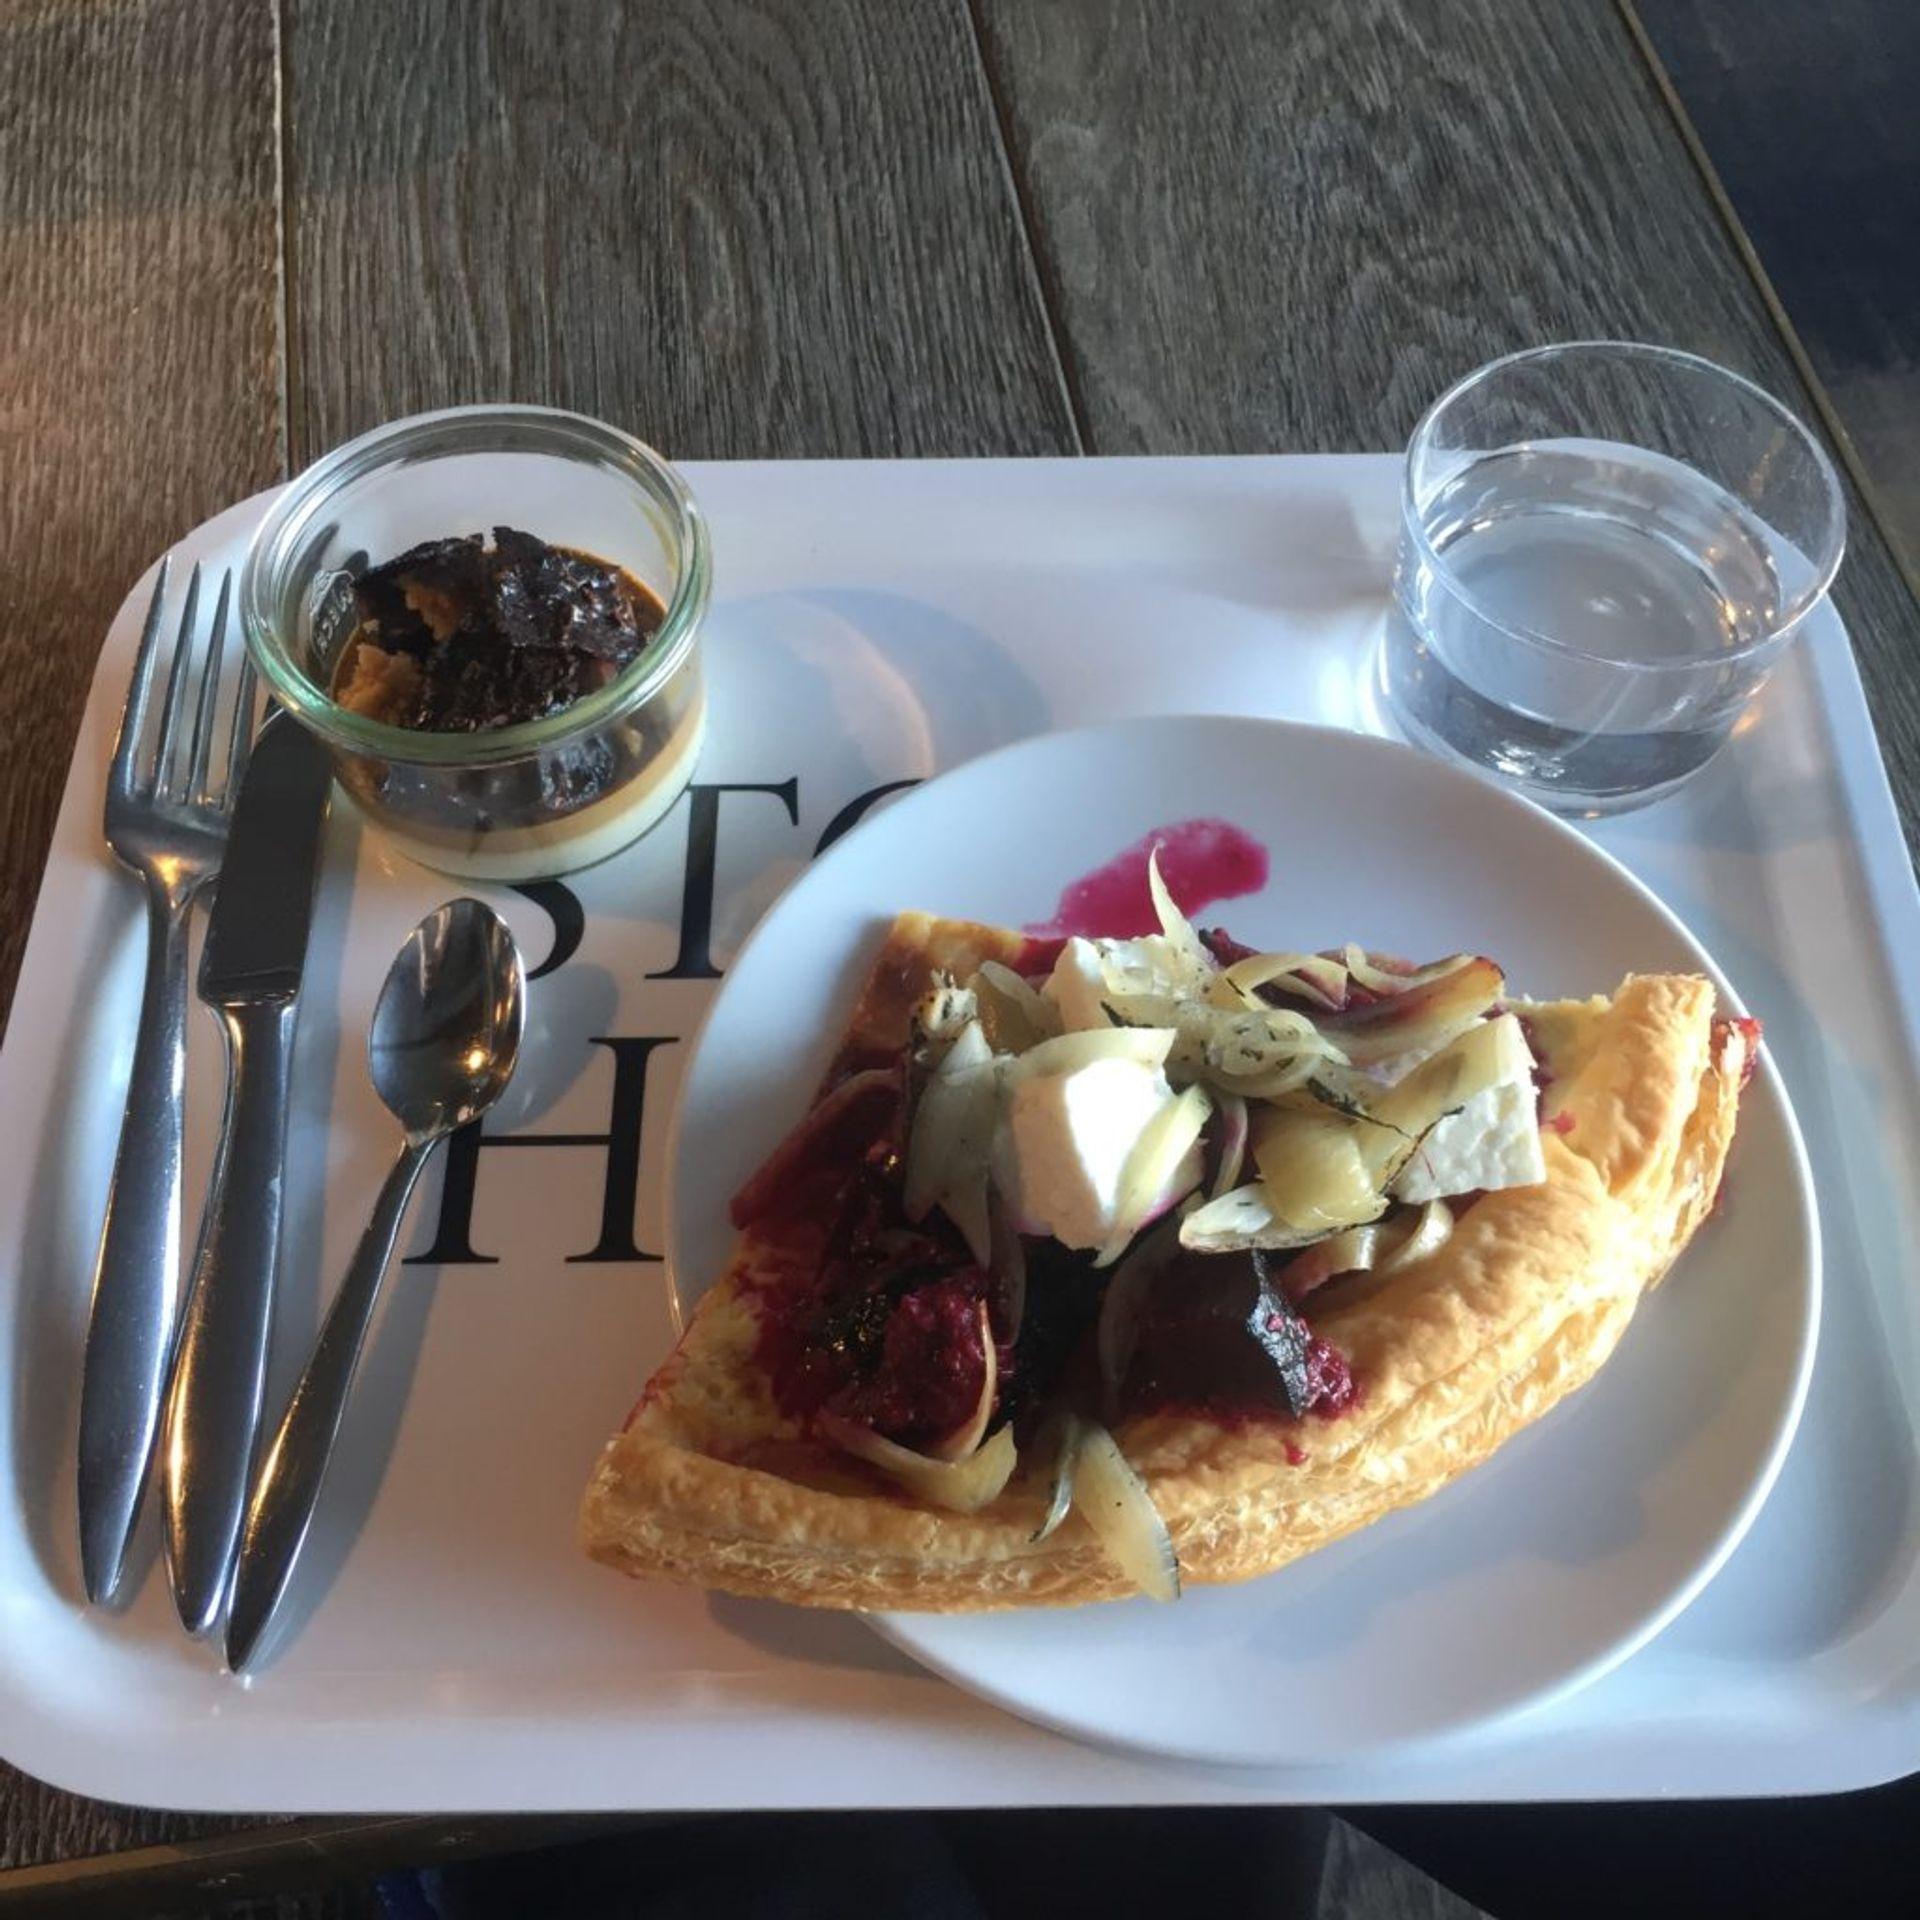 Feta and beetroot tart and panacotta